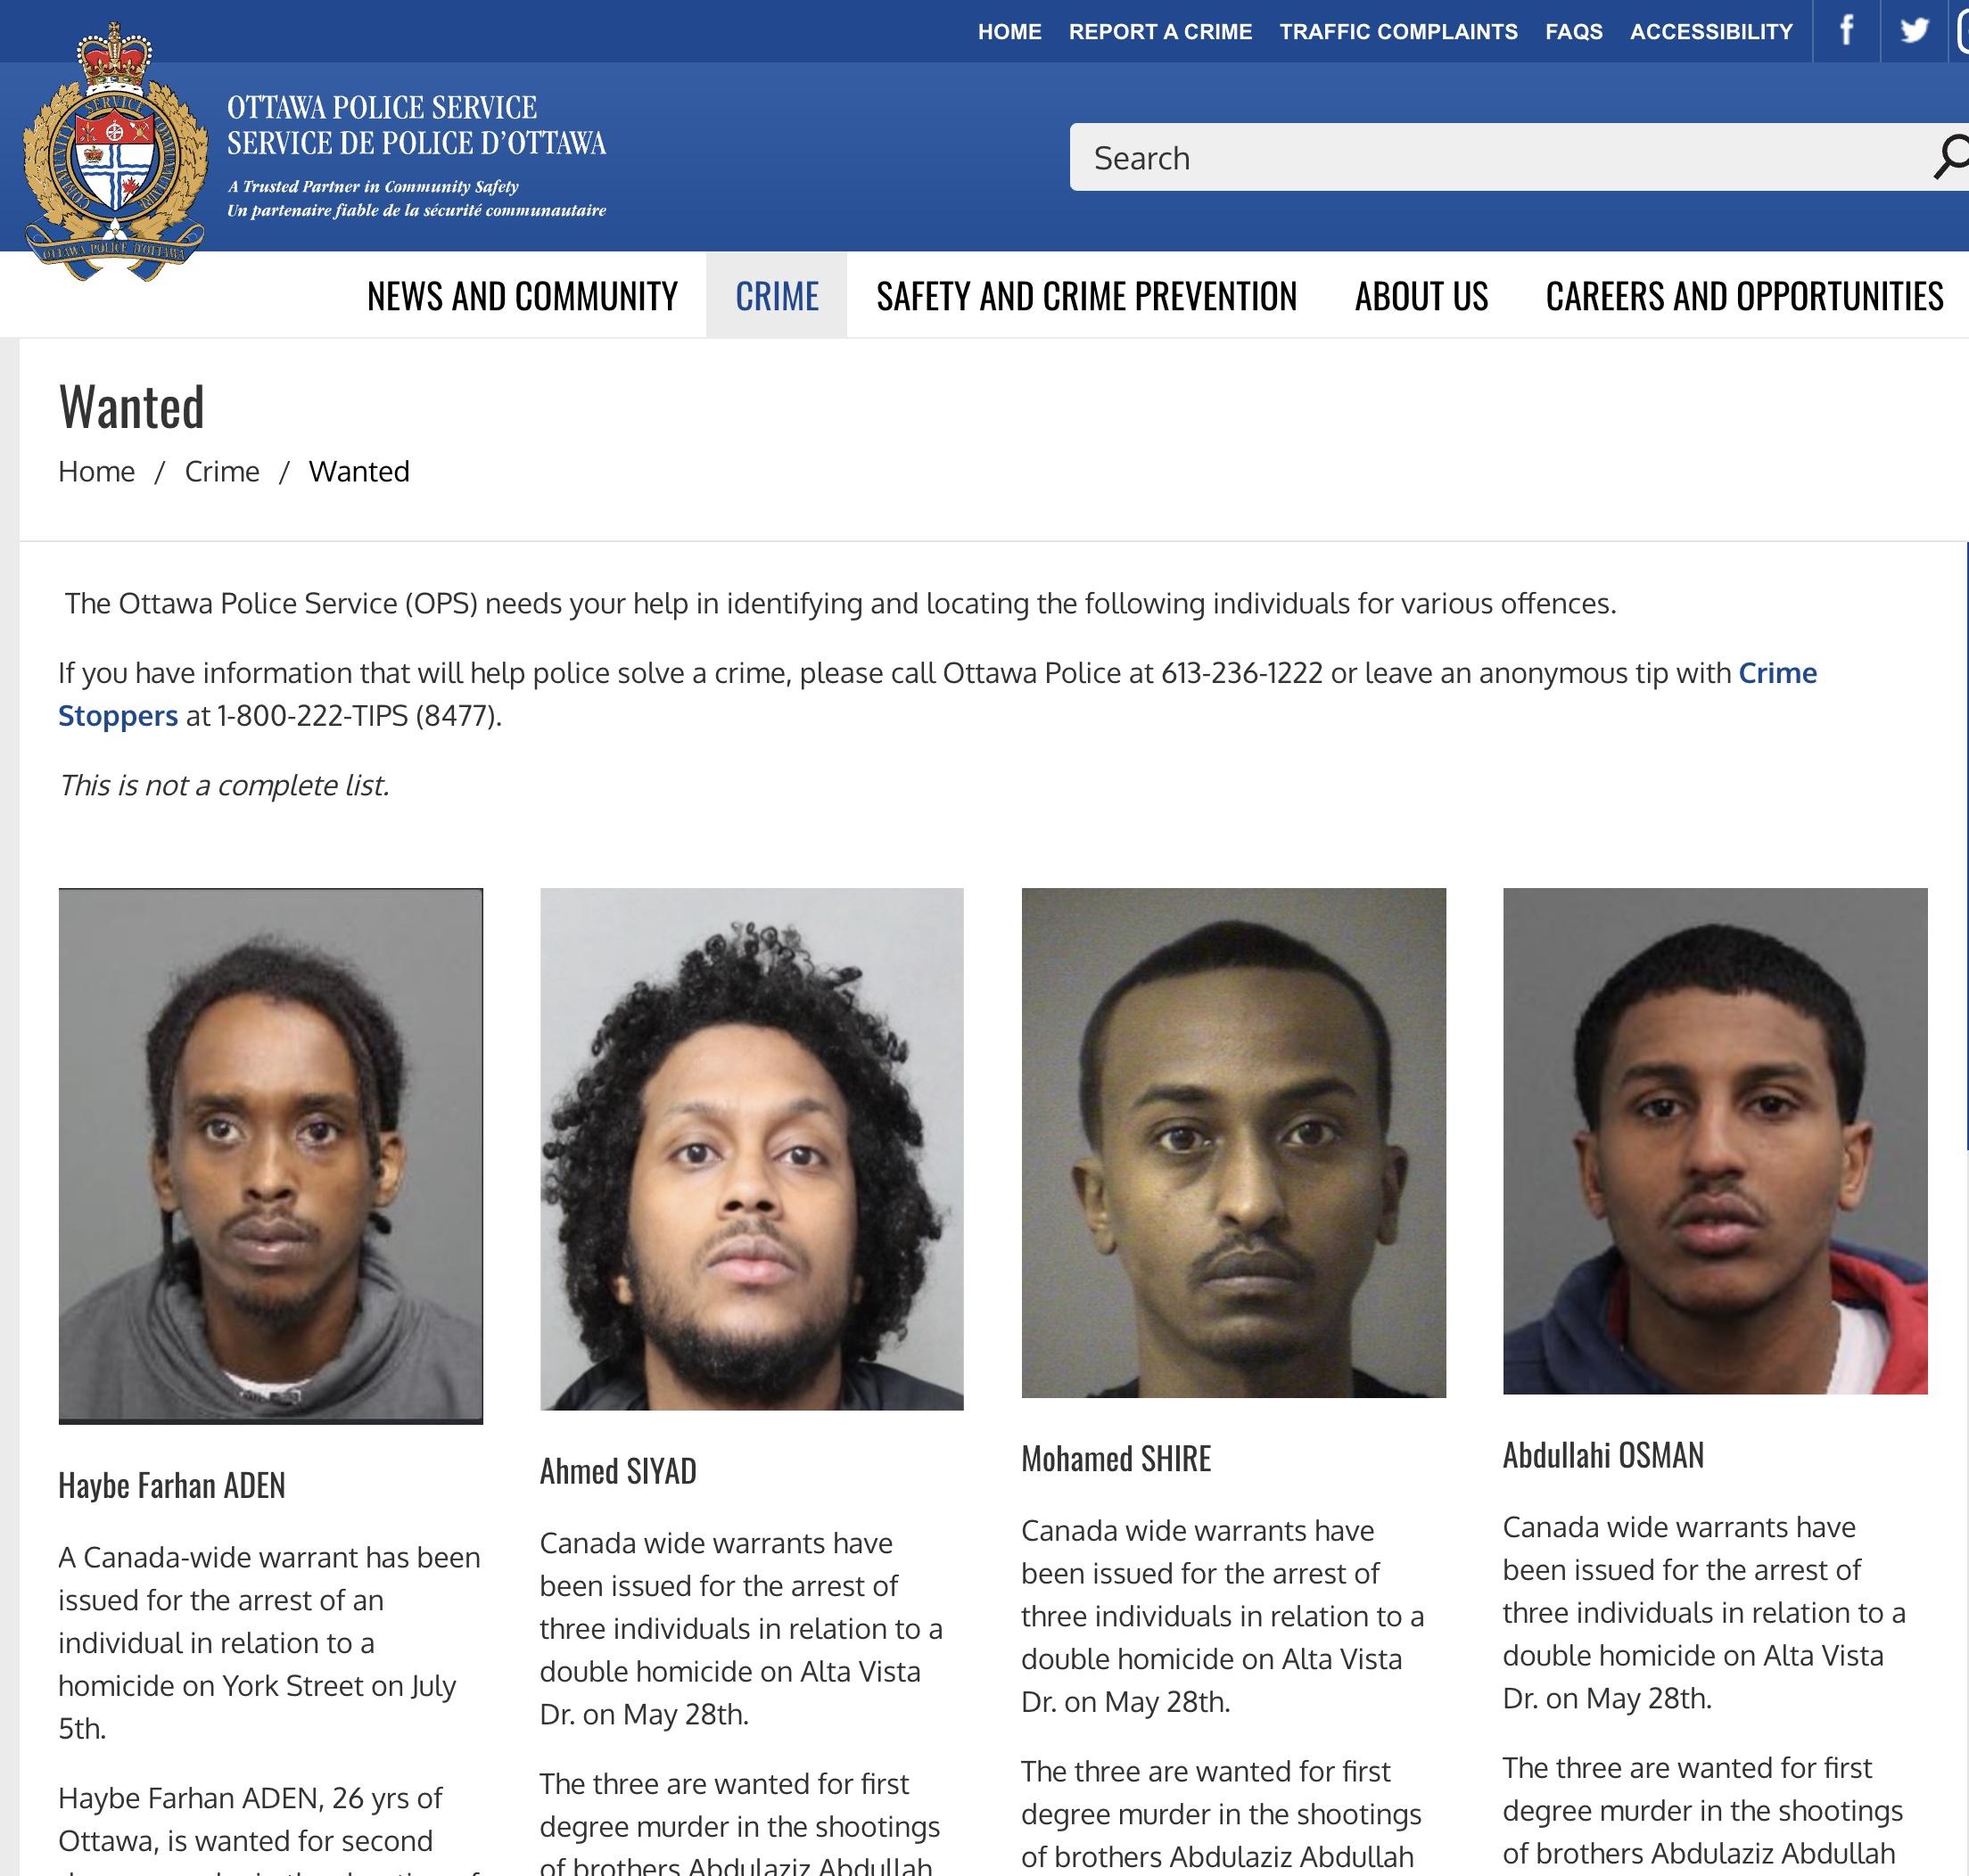 https://www.jihadwatch.org/wp-content/uploads/2021/10/Ottawa-police-service.jpg